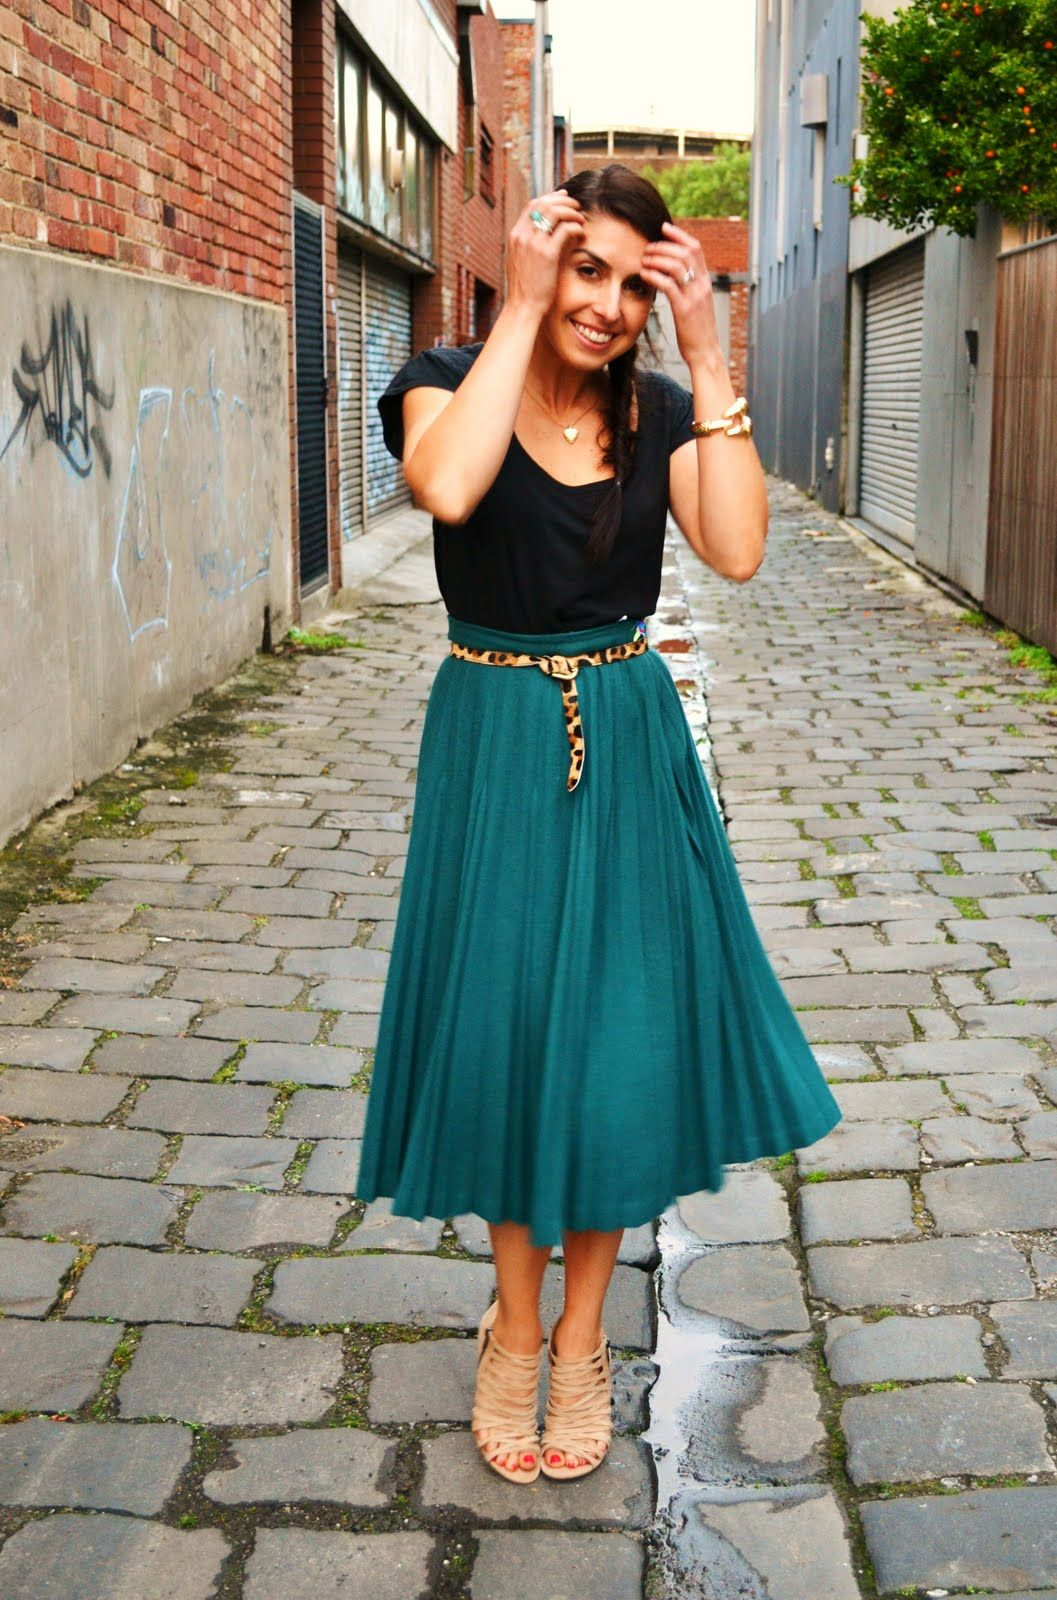 f7789355647 Black top, cheetah belt and teal skirt! Great!! | Fashion | Fashion ...